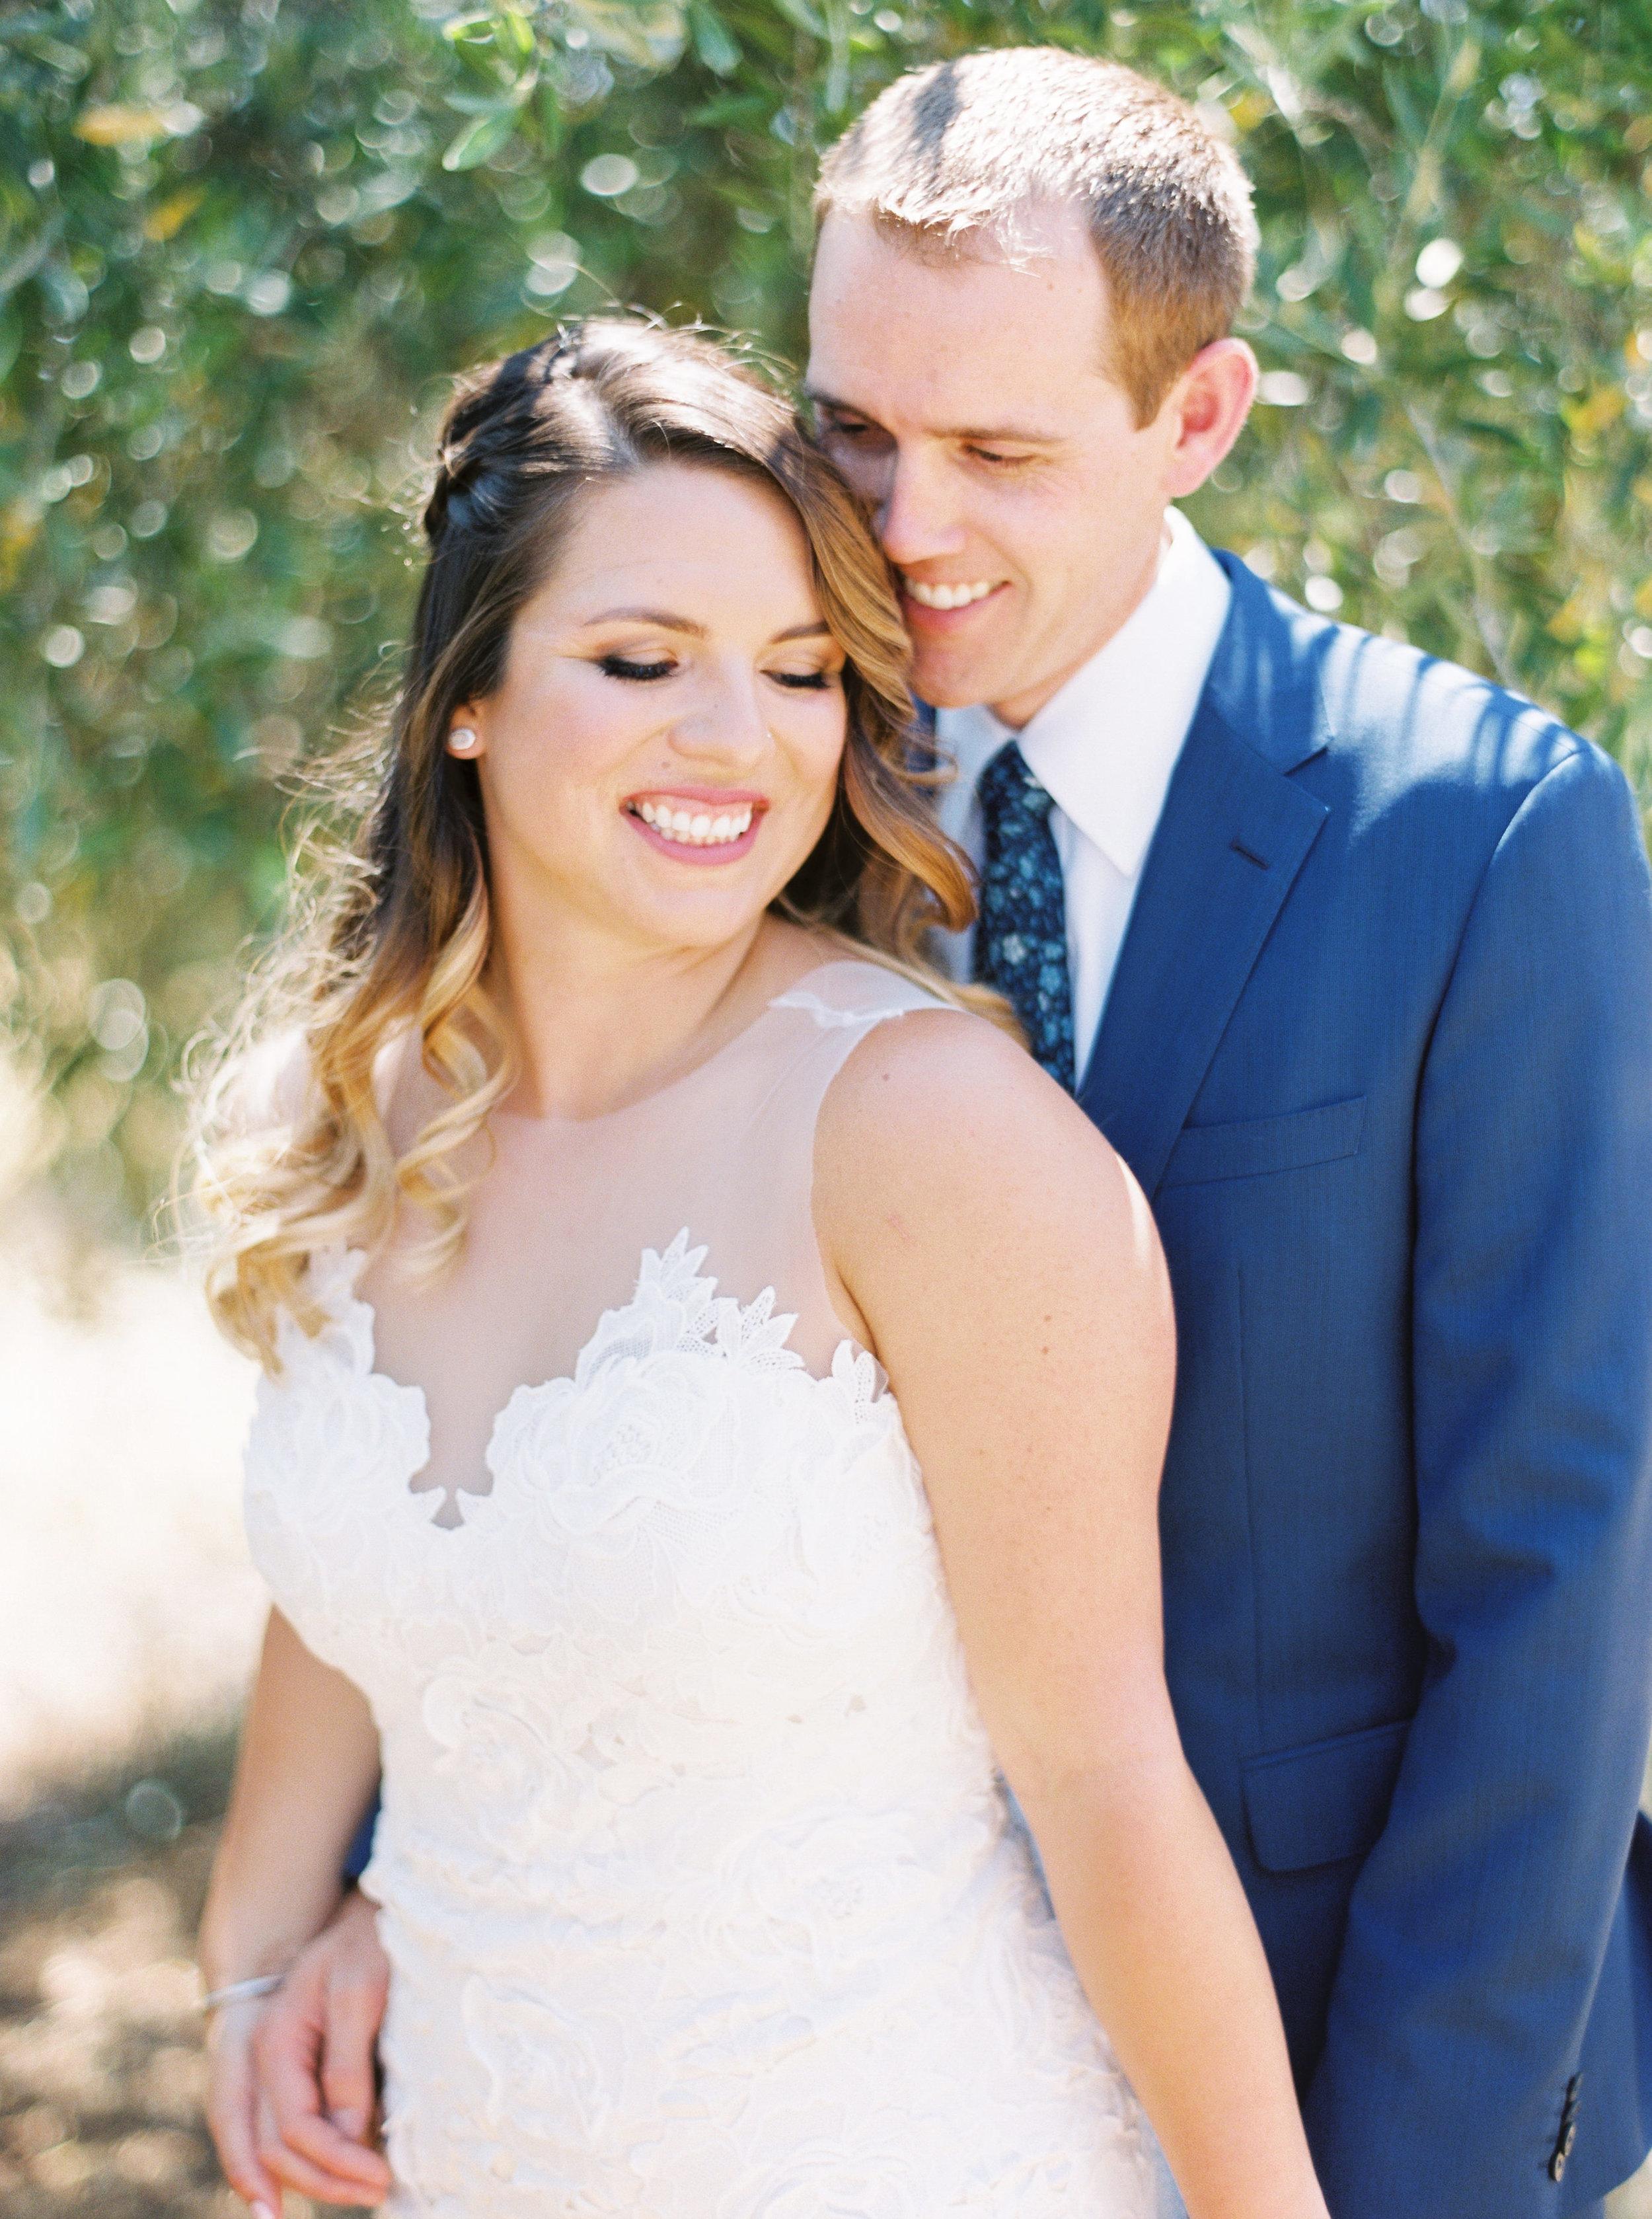 the-purple-orchid-resort-wedding-in-livermore-california-222.jpg